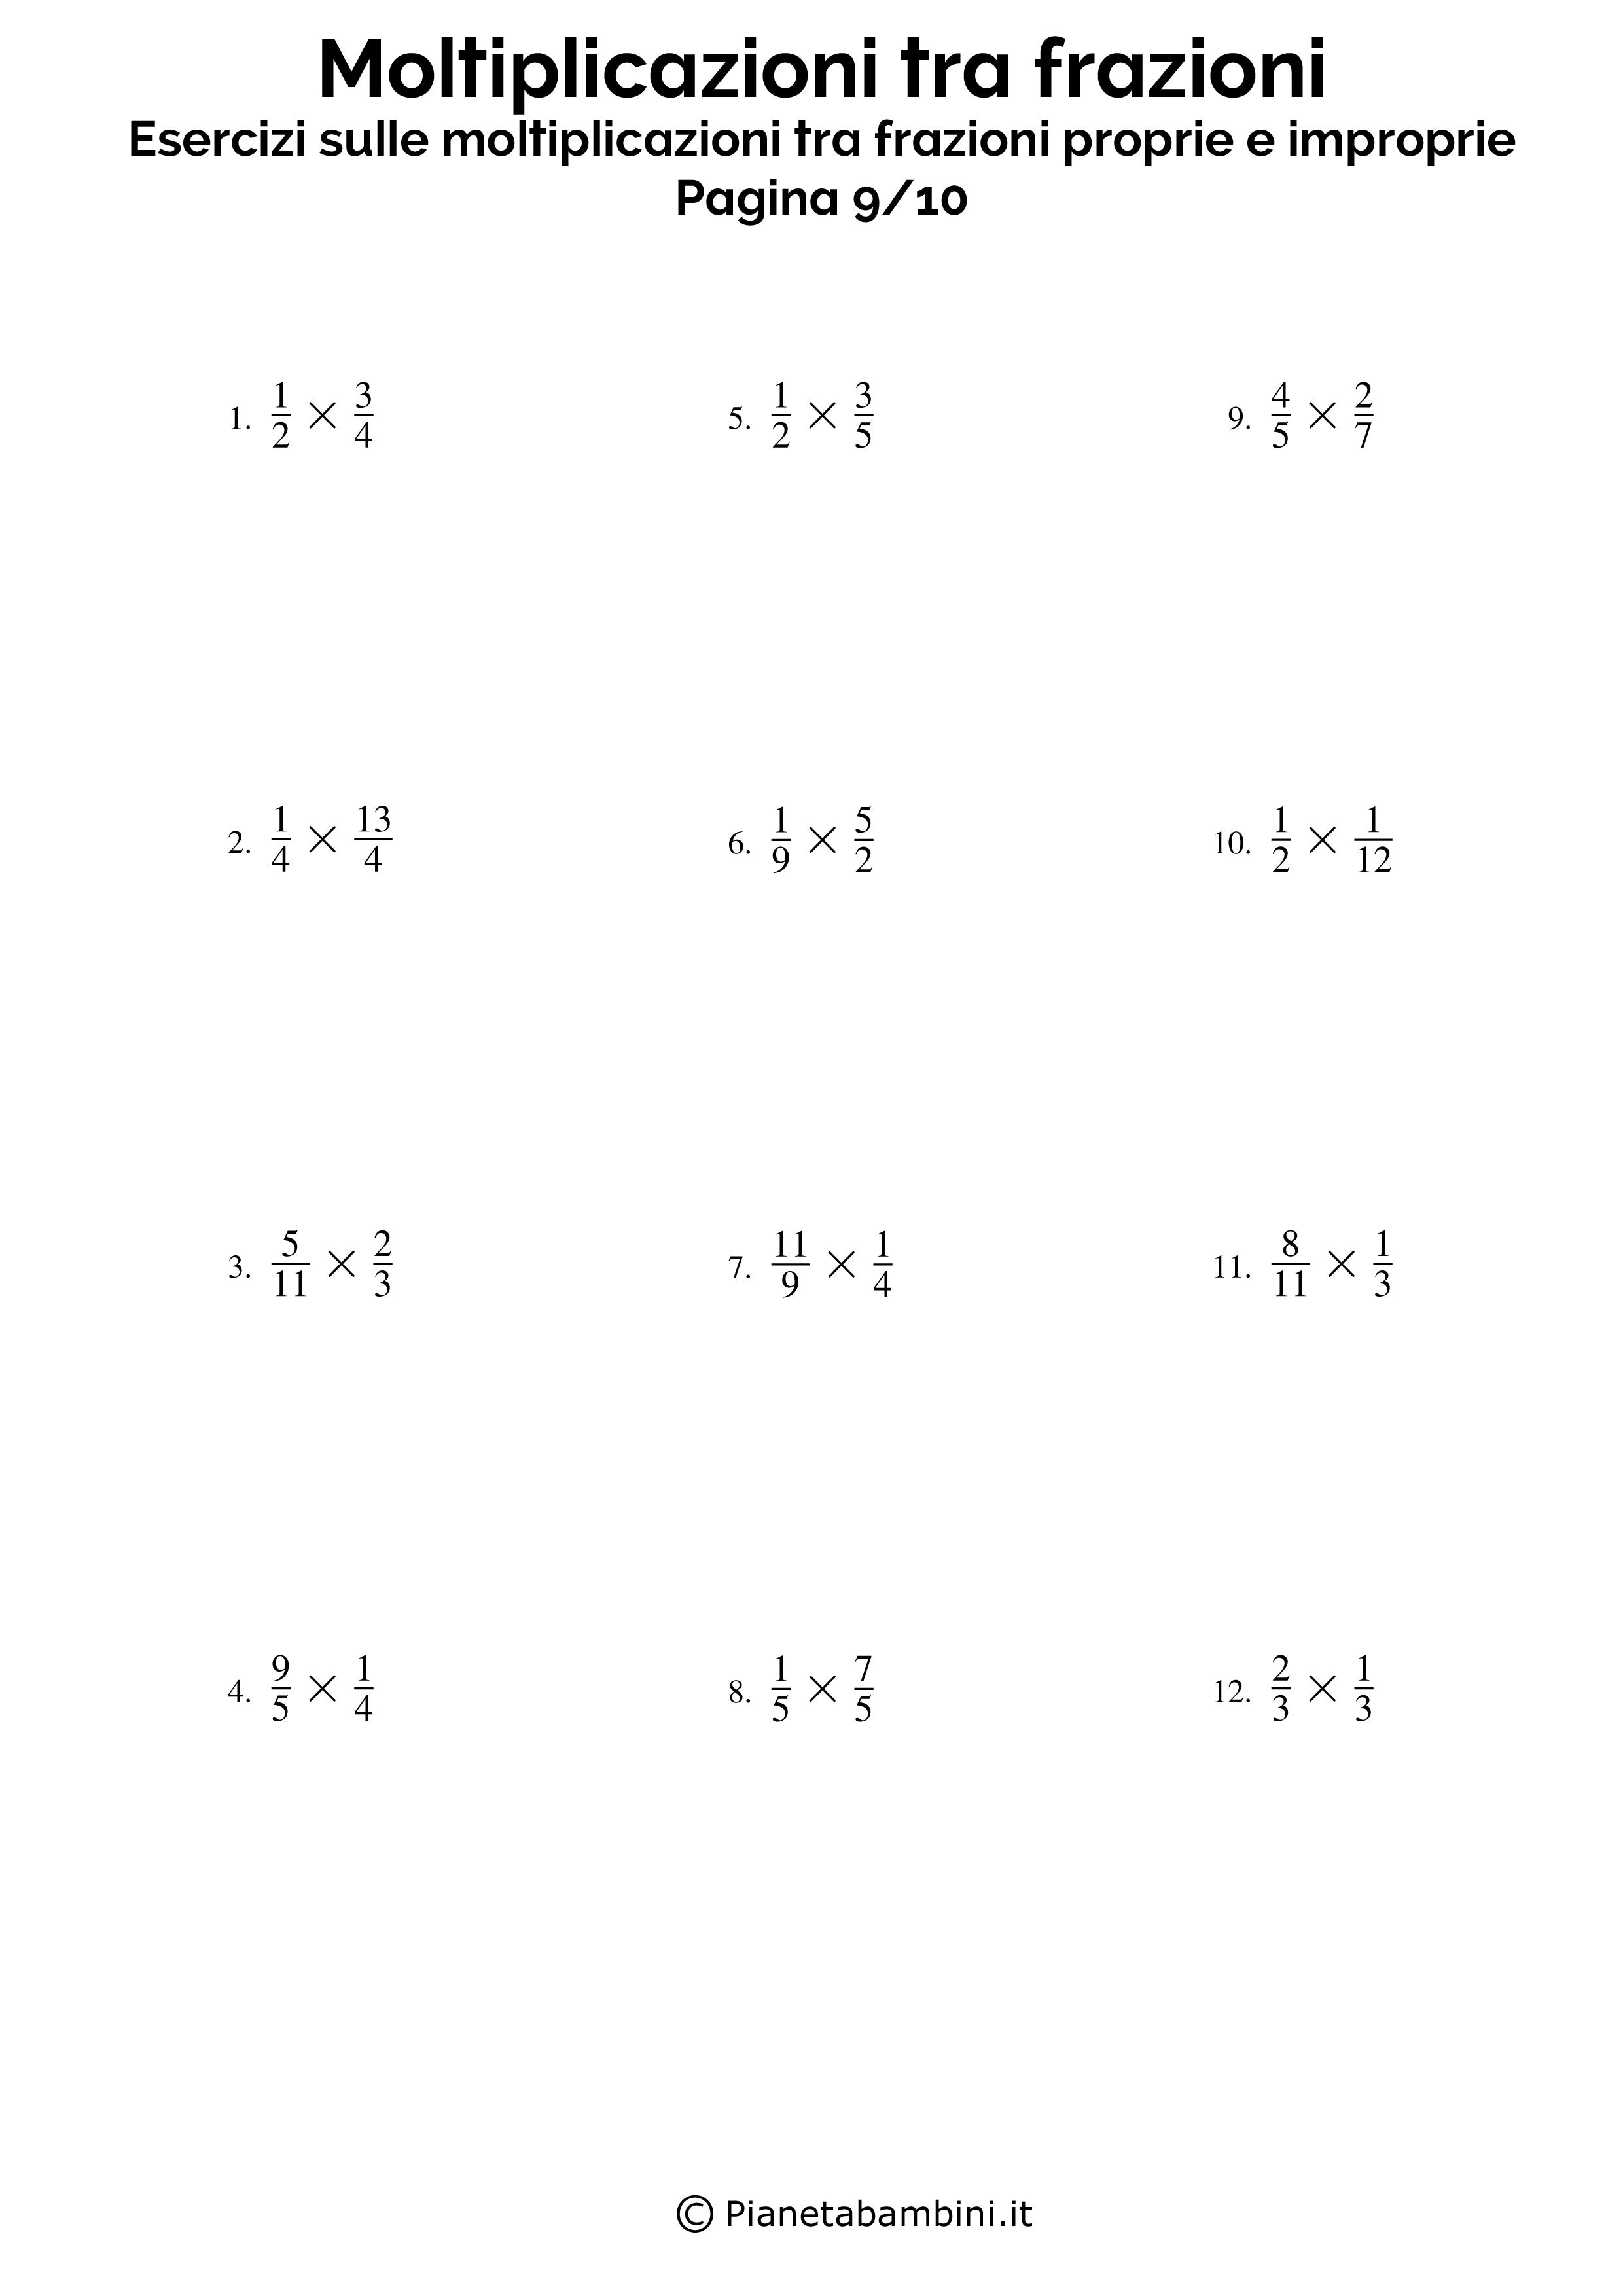 Moltiplicazioni-Frazioni-Proprie-Improprie_09